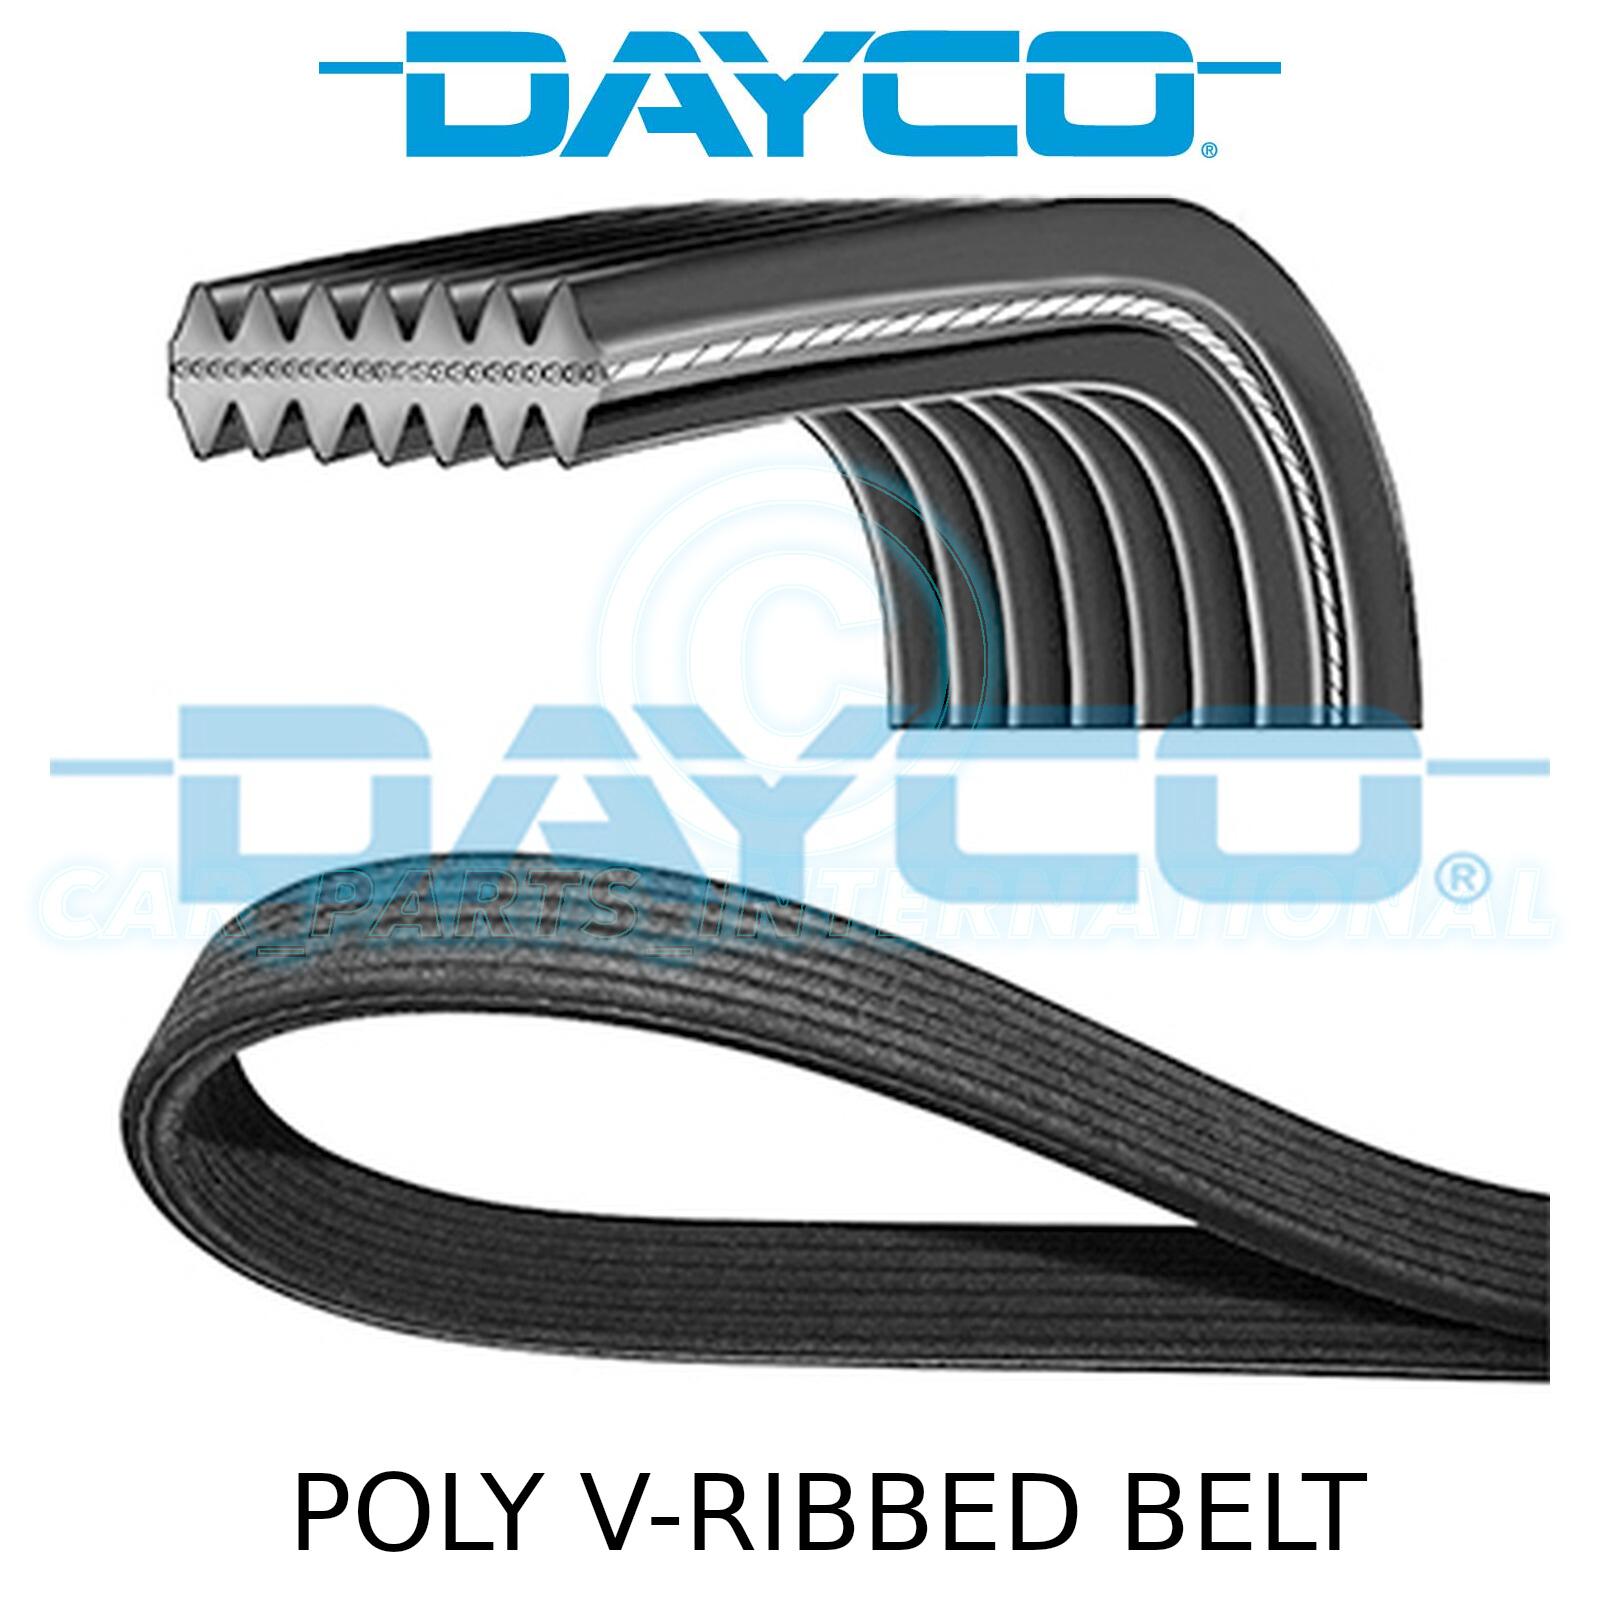 DAYCO POLY V-RIBBED BELT 6PK1660 6 RIBS 1660MM AUXILIARY FAN DRIVE ALTERNATOR